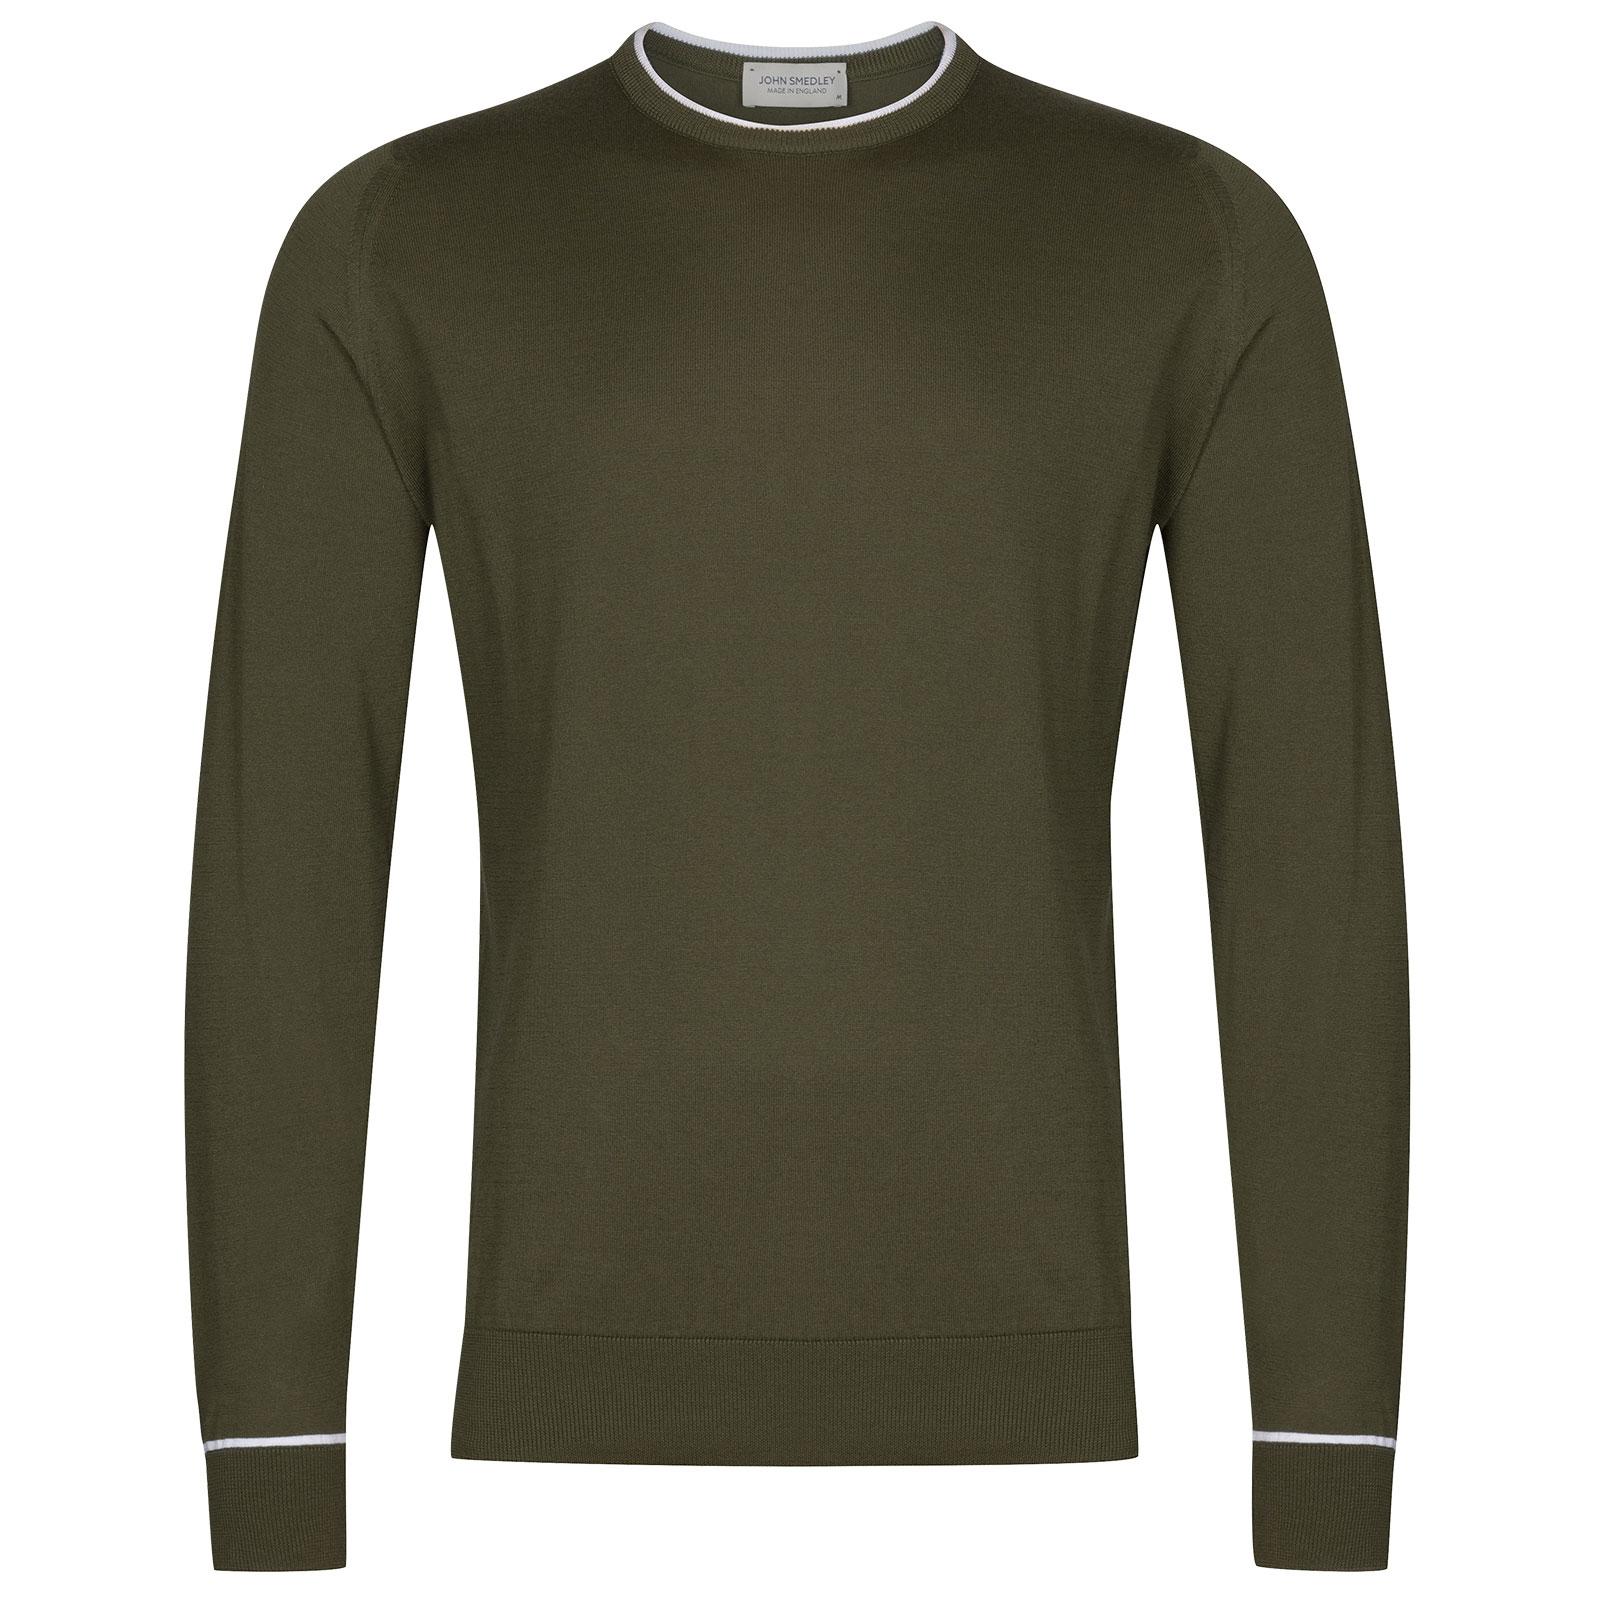 John Smedley Astin in Sepal Green Pullover-XXL